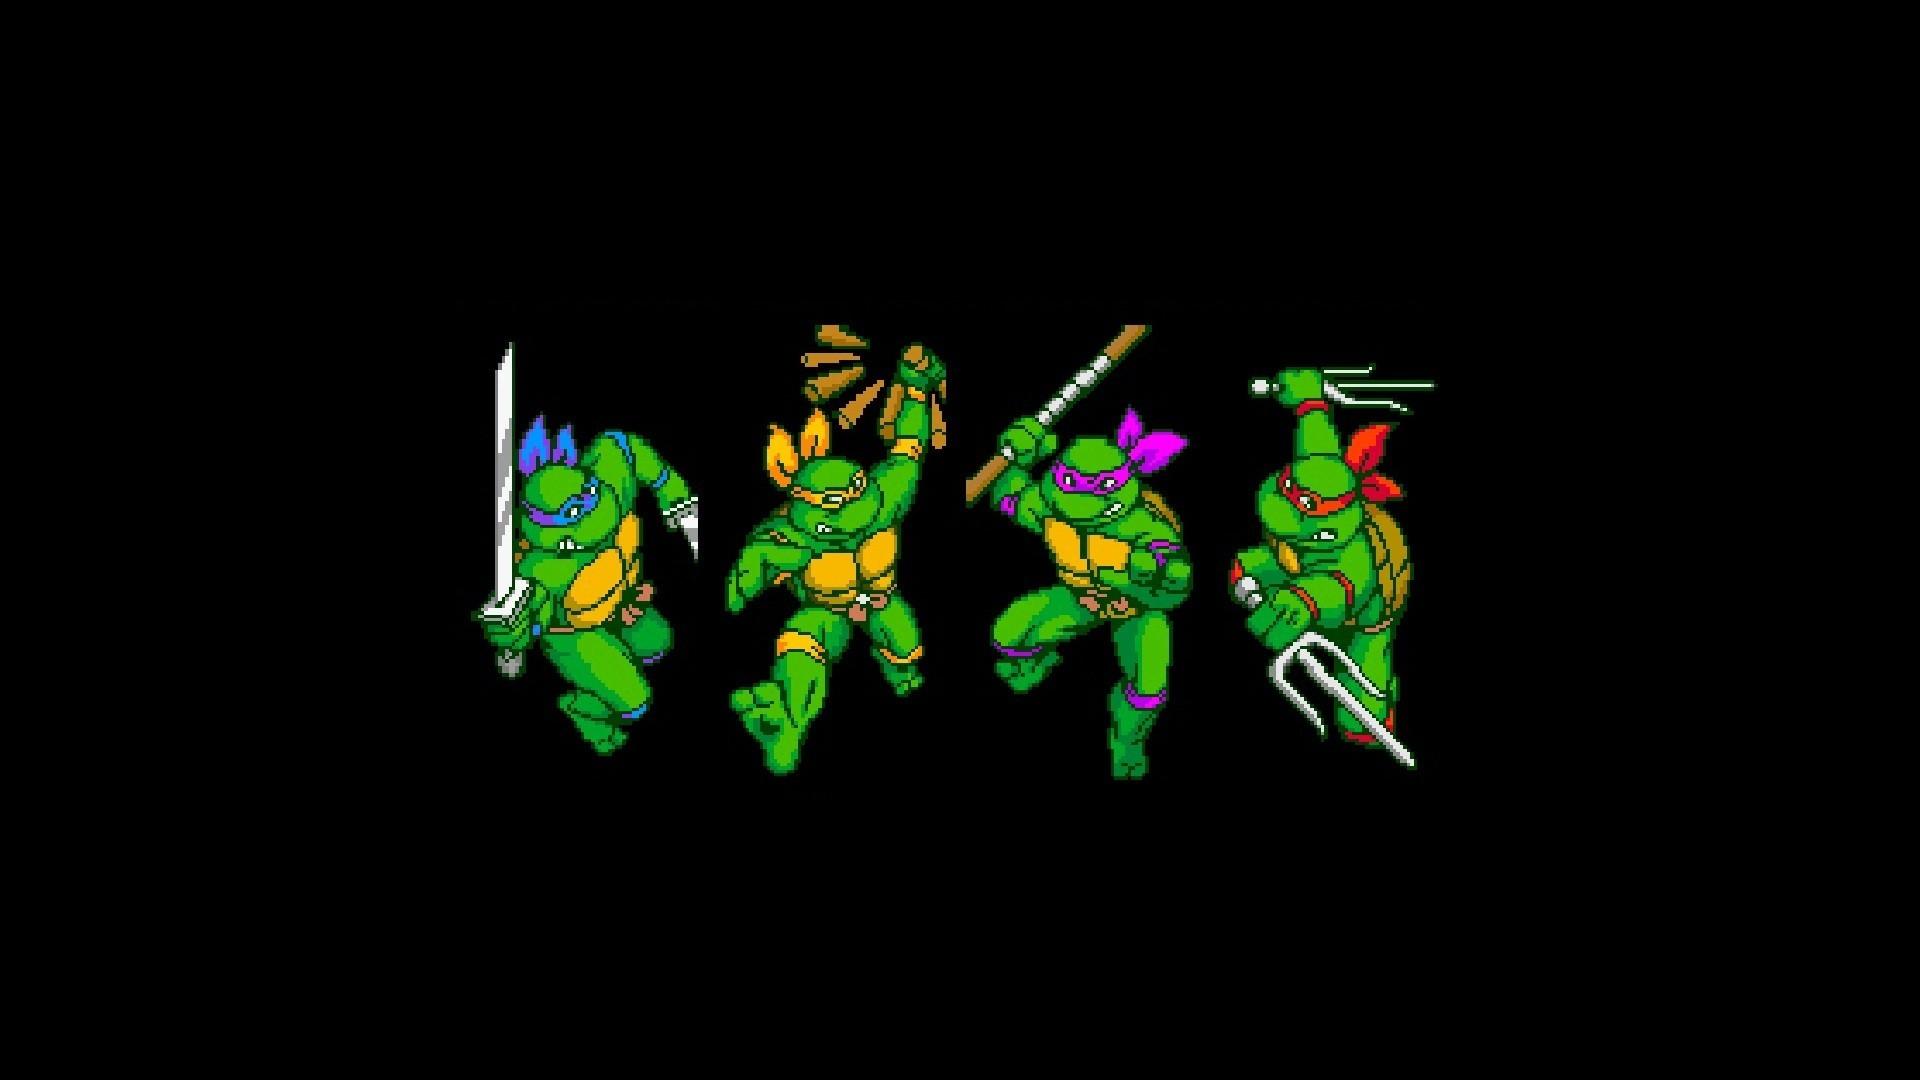 2 Teenage Mutant Ninja Turtles IV: Turtles in Time HD Wallpapers    Backgrounds – Wallpaper Abyss